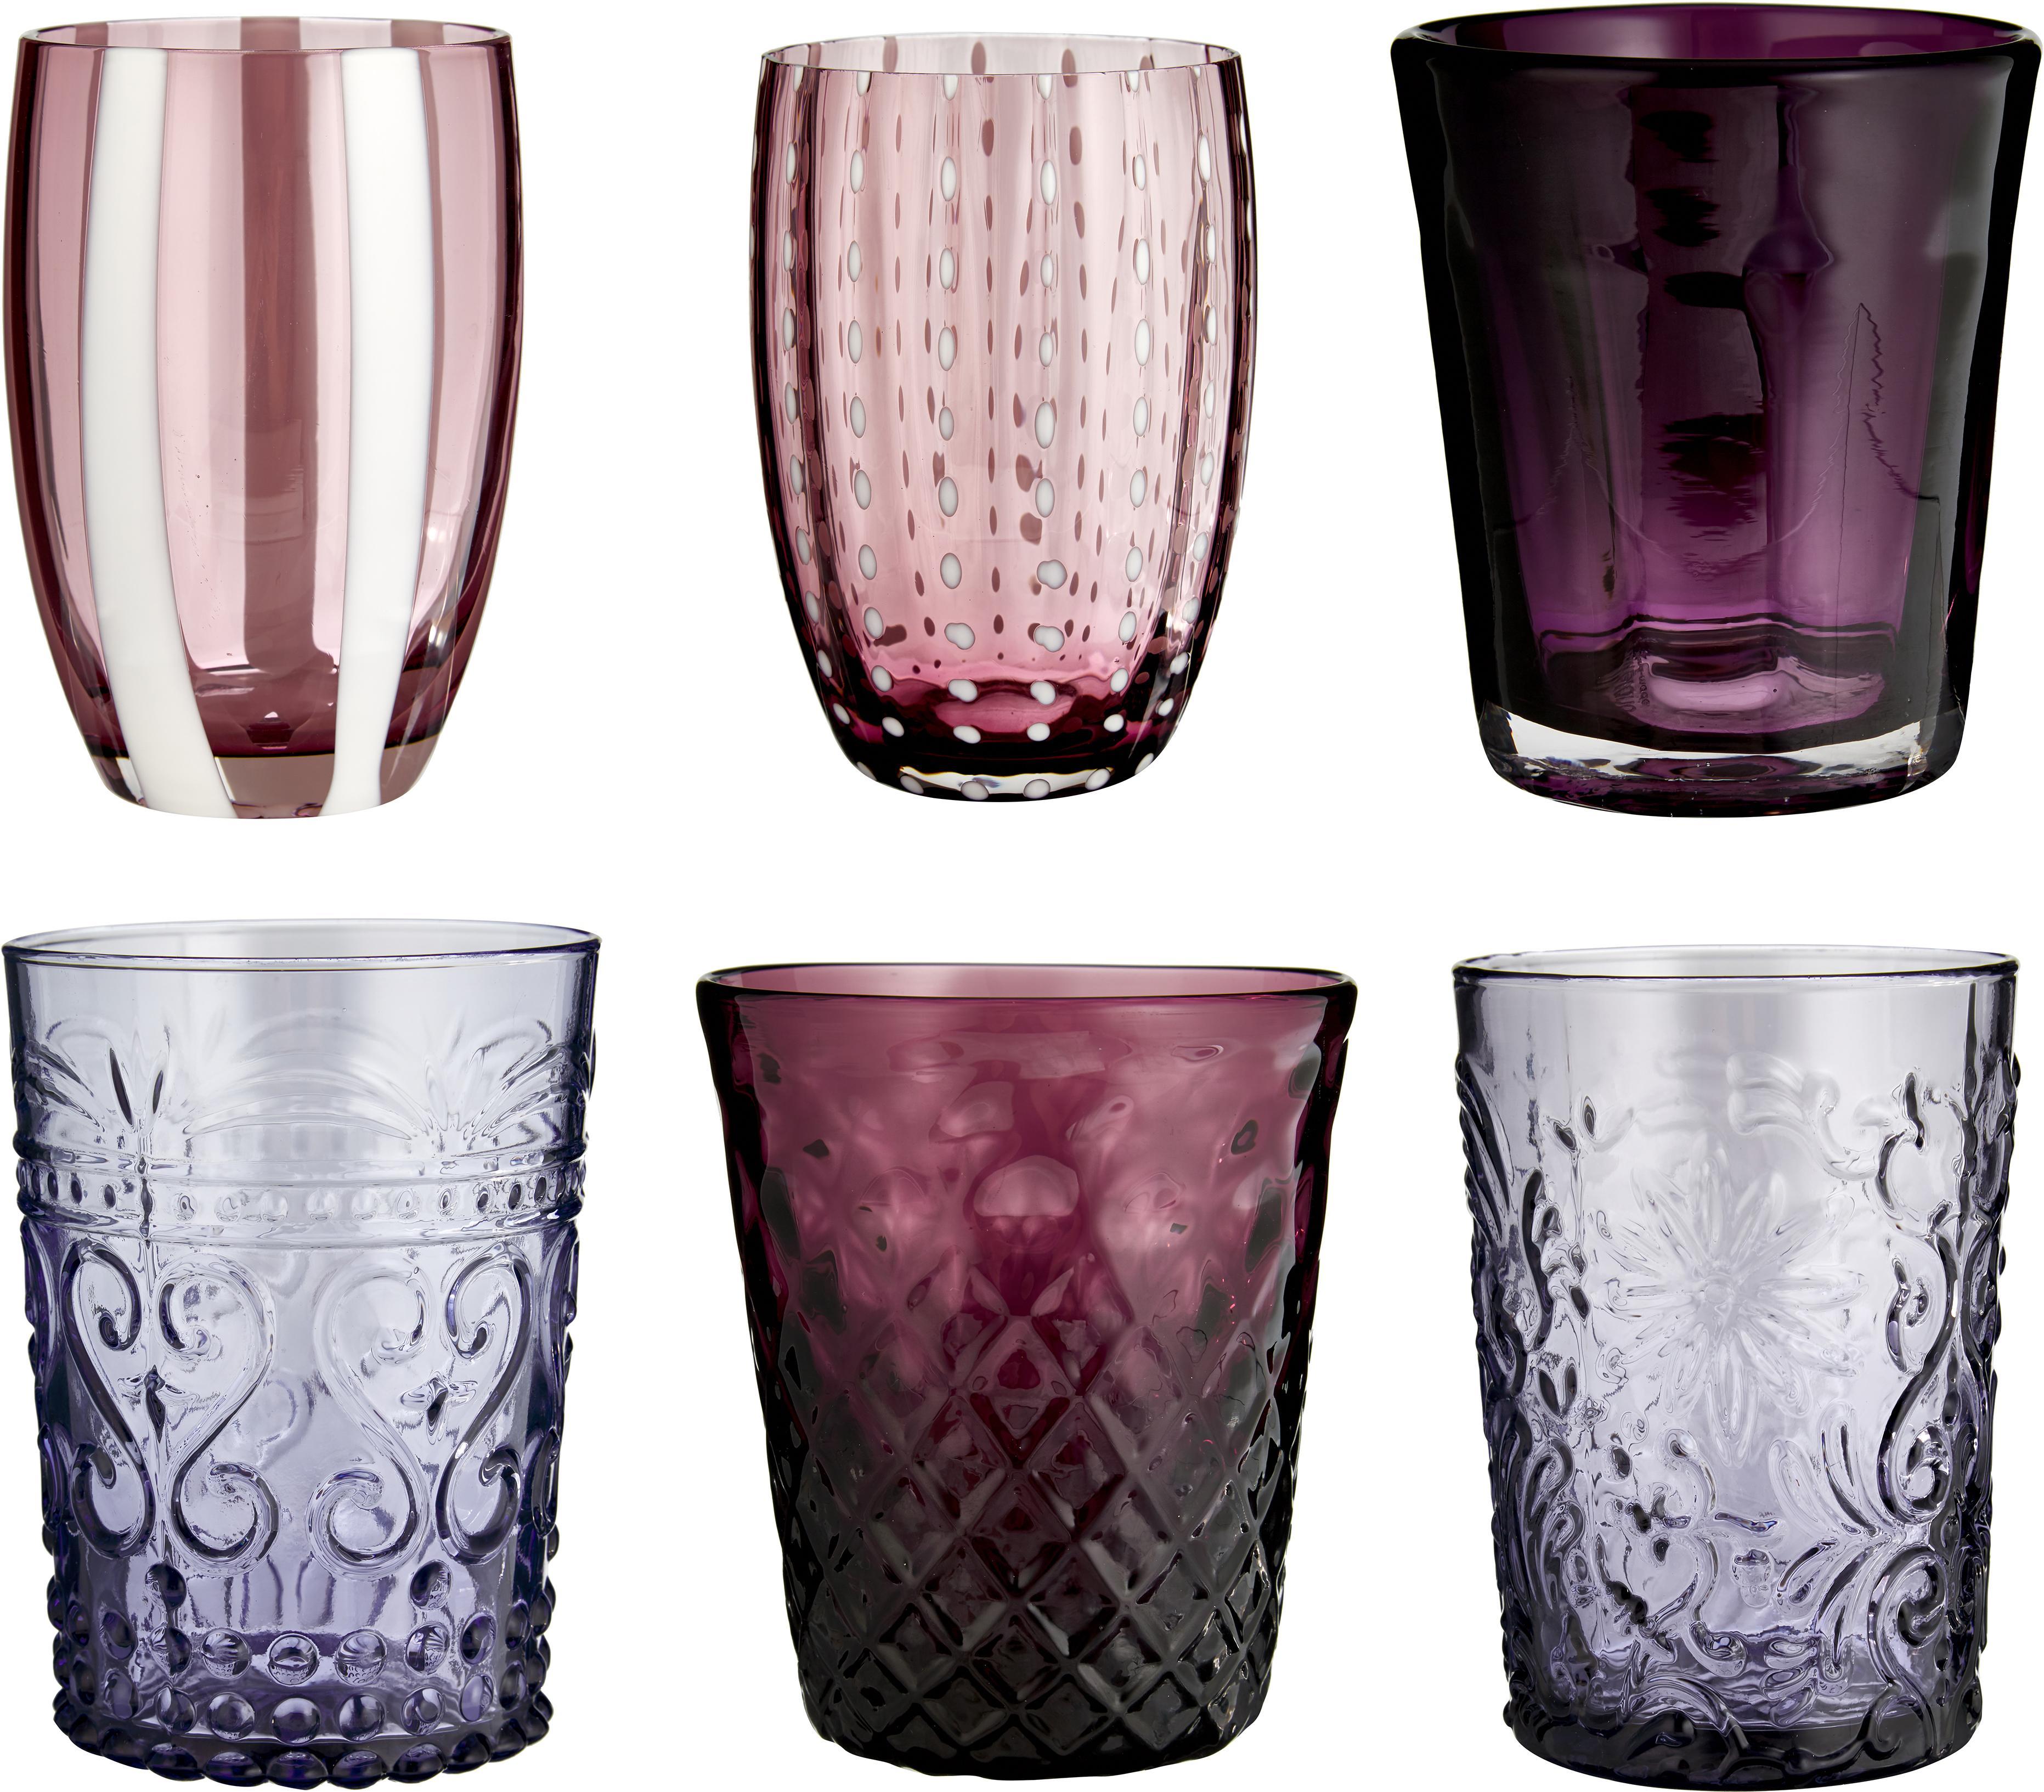 Set 6 bicchieri acqua in vetro soffiato Pot Berry, Vetro, Tonalità blu, tonalità rosse, Set in varie misure